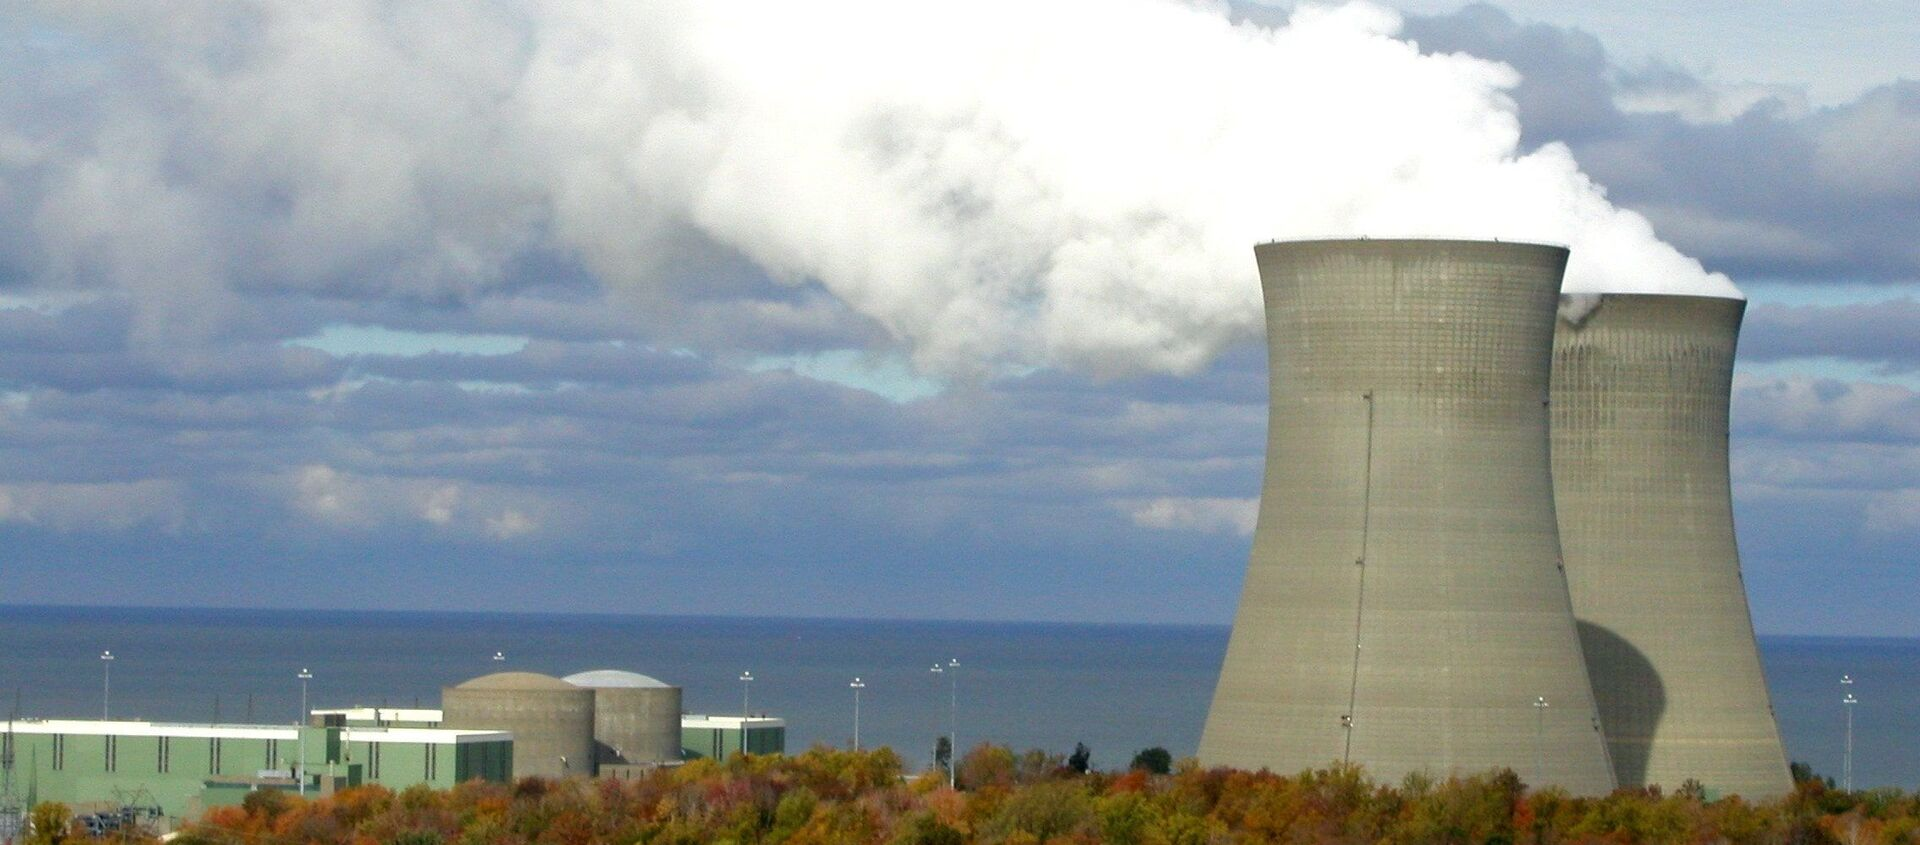 Perry Nuclear Power Plant, Unit 1 - Sputnik International, 1920, 20.10.2020